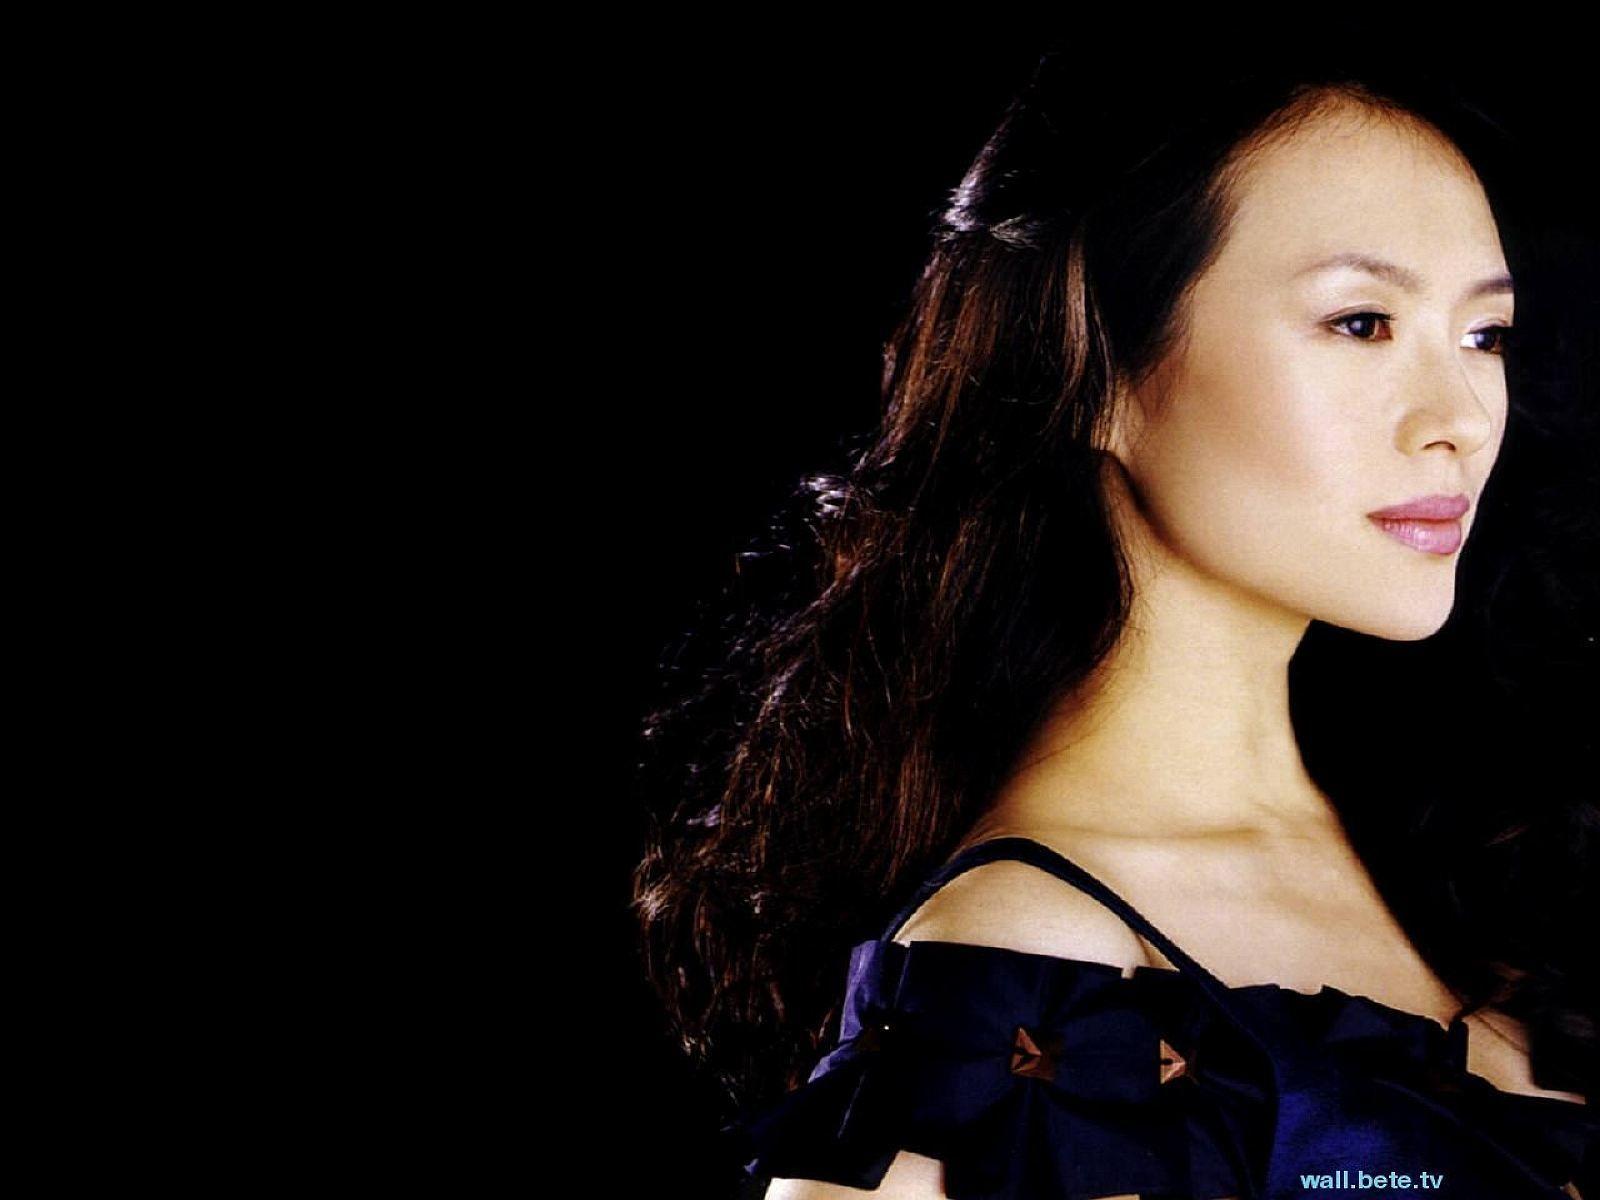 http://2.bp.blogspot.com/-shkyjeVaxcE/TfuAsiKdltI/AAAAAAAAAgg/MAQqWBzGcr8/s1600/Zhang_Ziyi.jpg